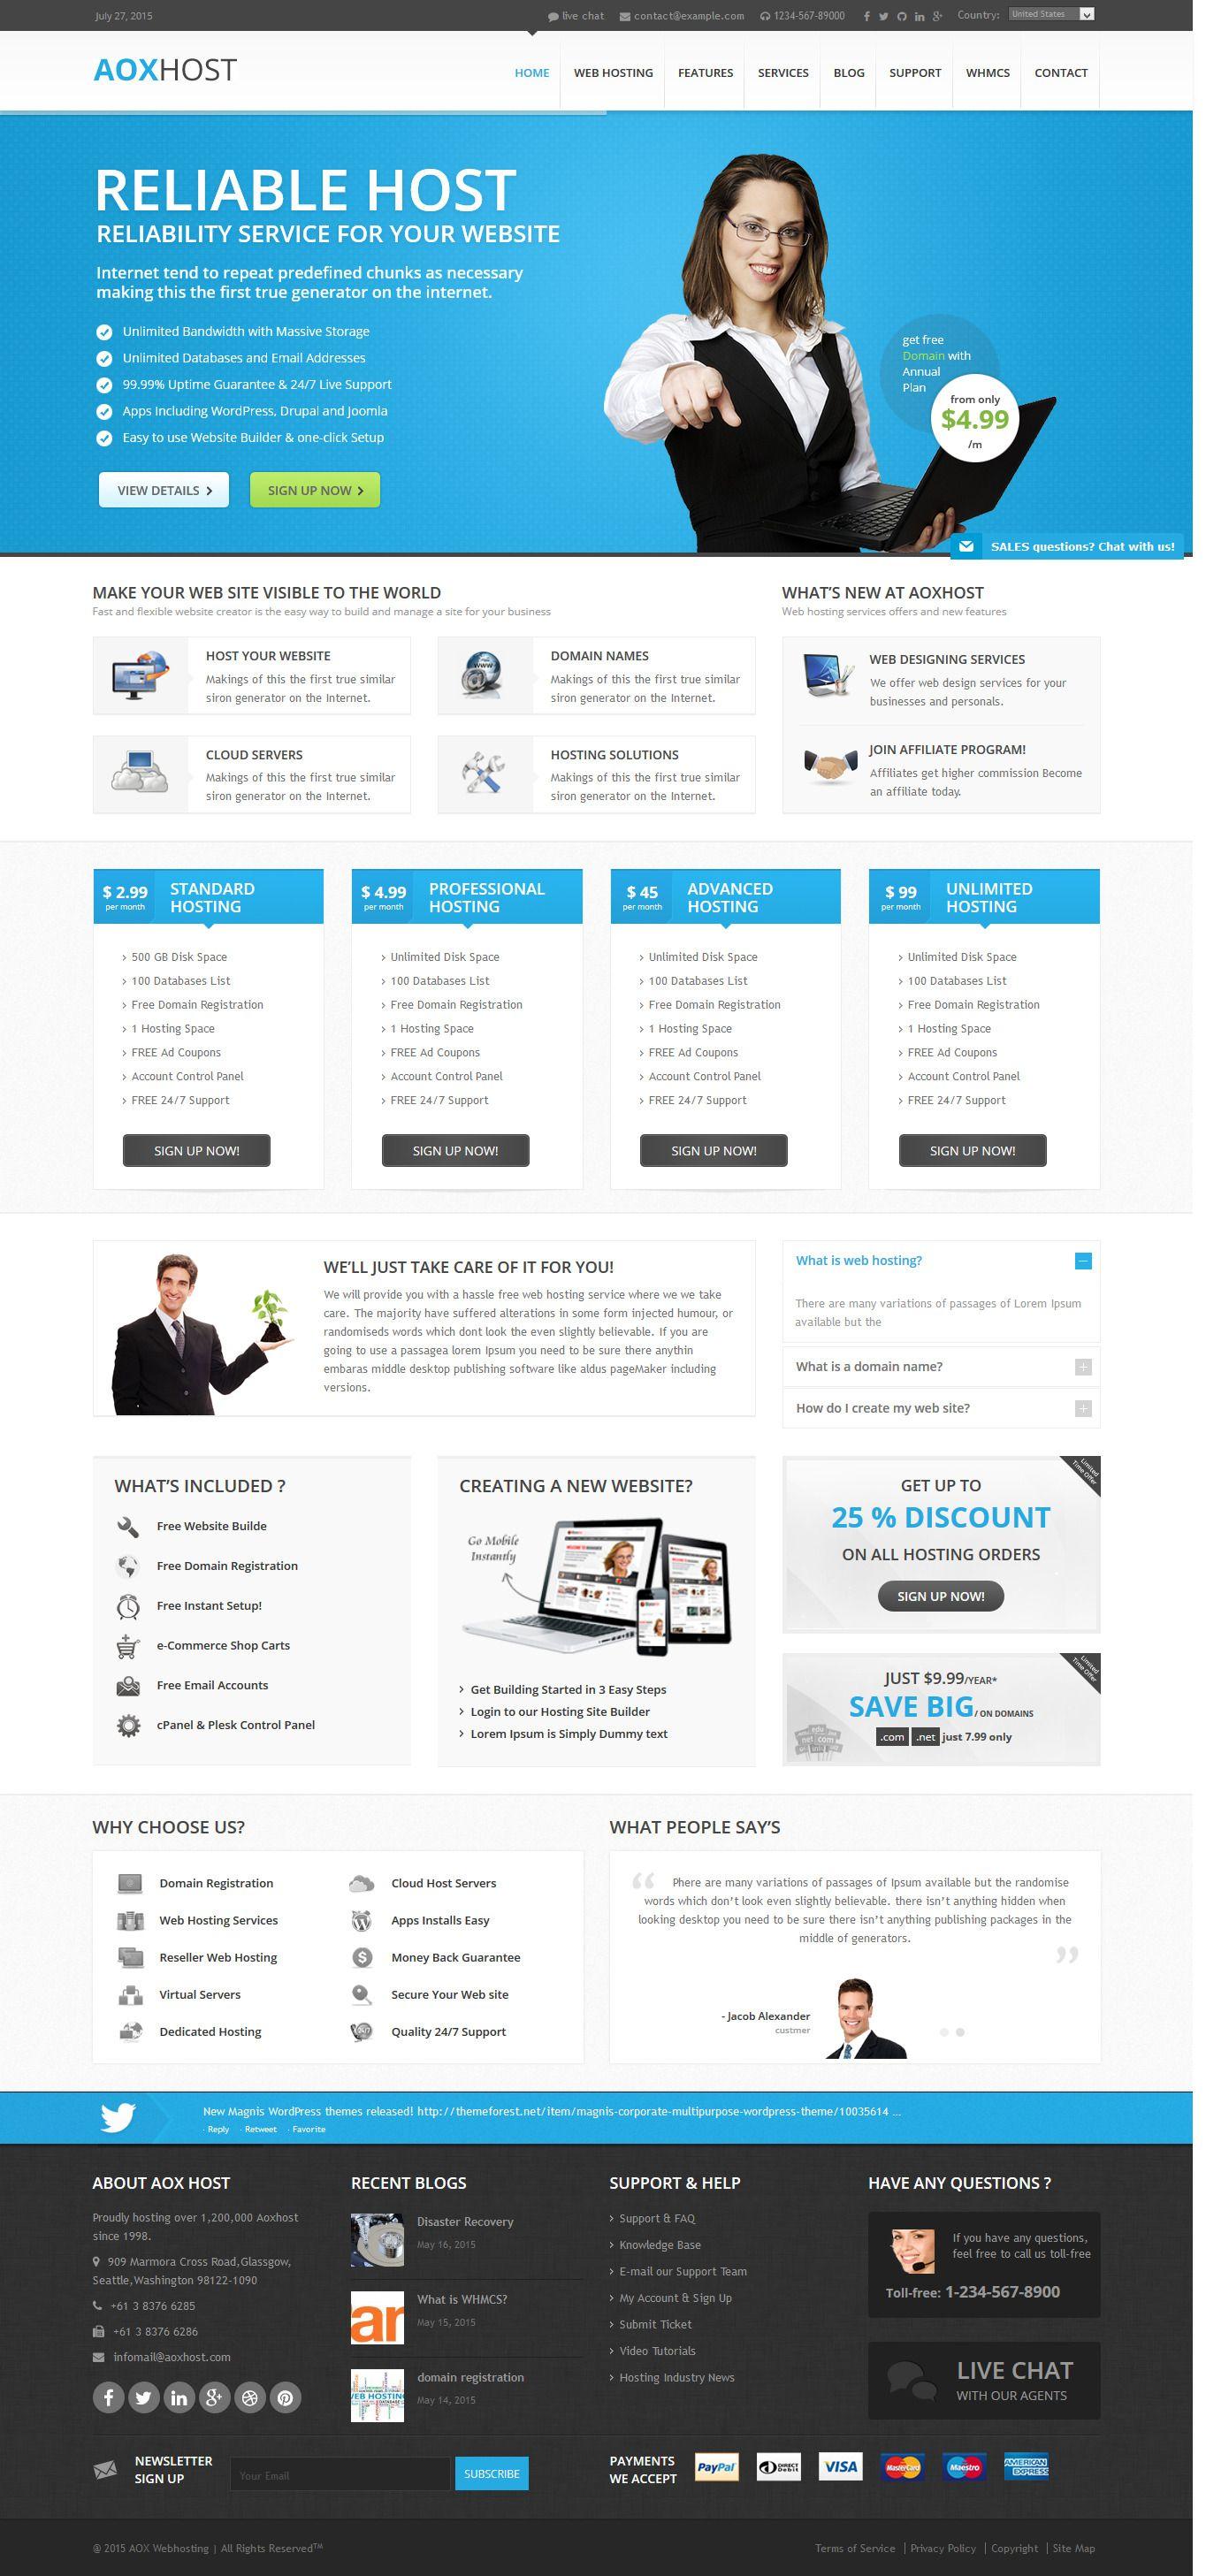 AOX HOST - A Professional Hosting Theme + WHMCS Theme #webdesign #website Download: http://themeforest.net/item/aox-host-a-professional-hosting-theme-whmcs/12148935?ref=ksioks